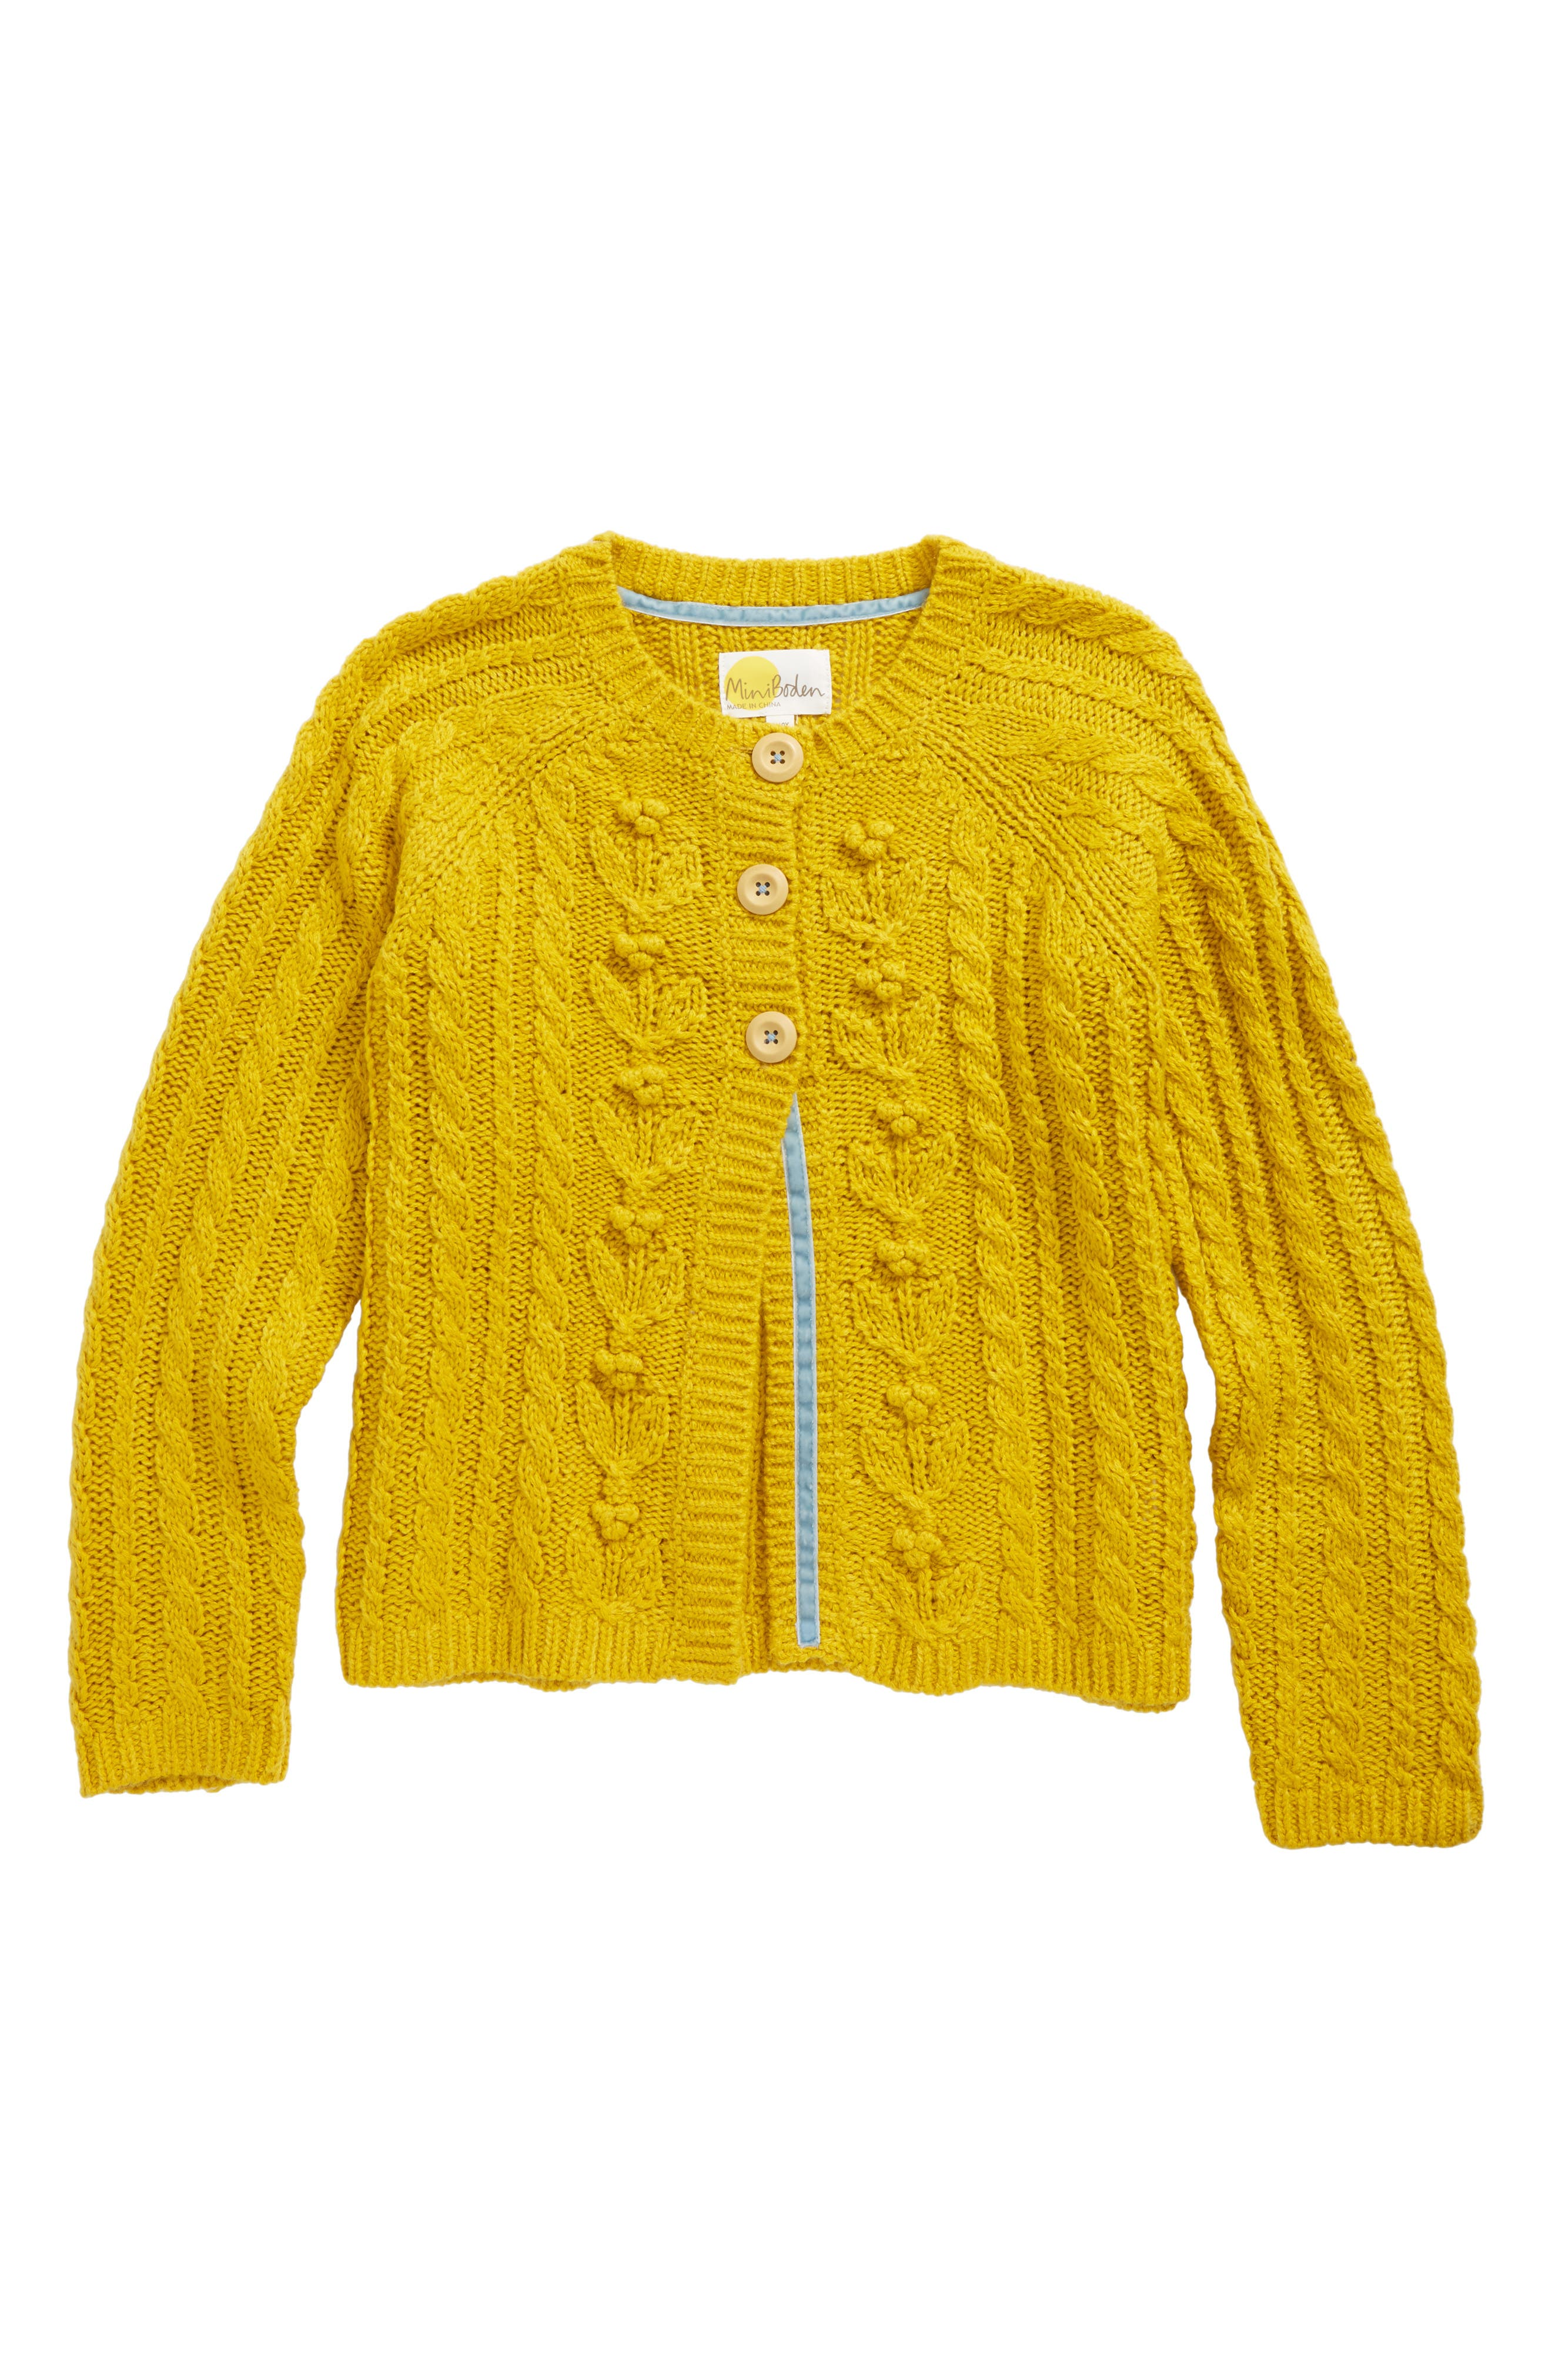 Cable Knit Cardigan,                             Main thumbnail 1, color,                             Saffron Yellow